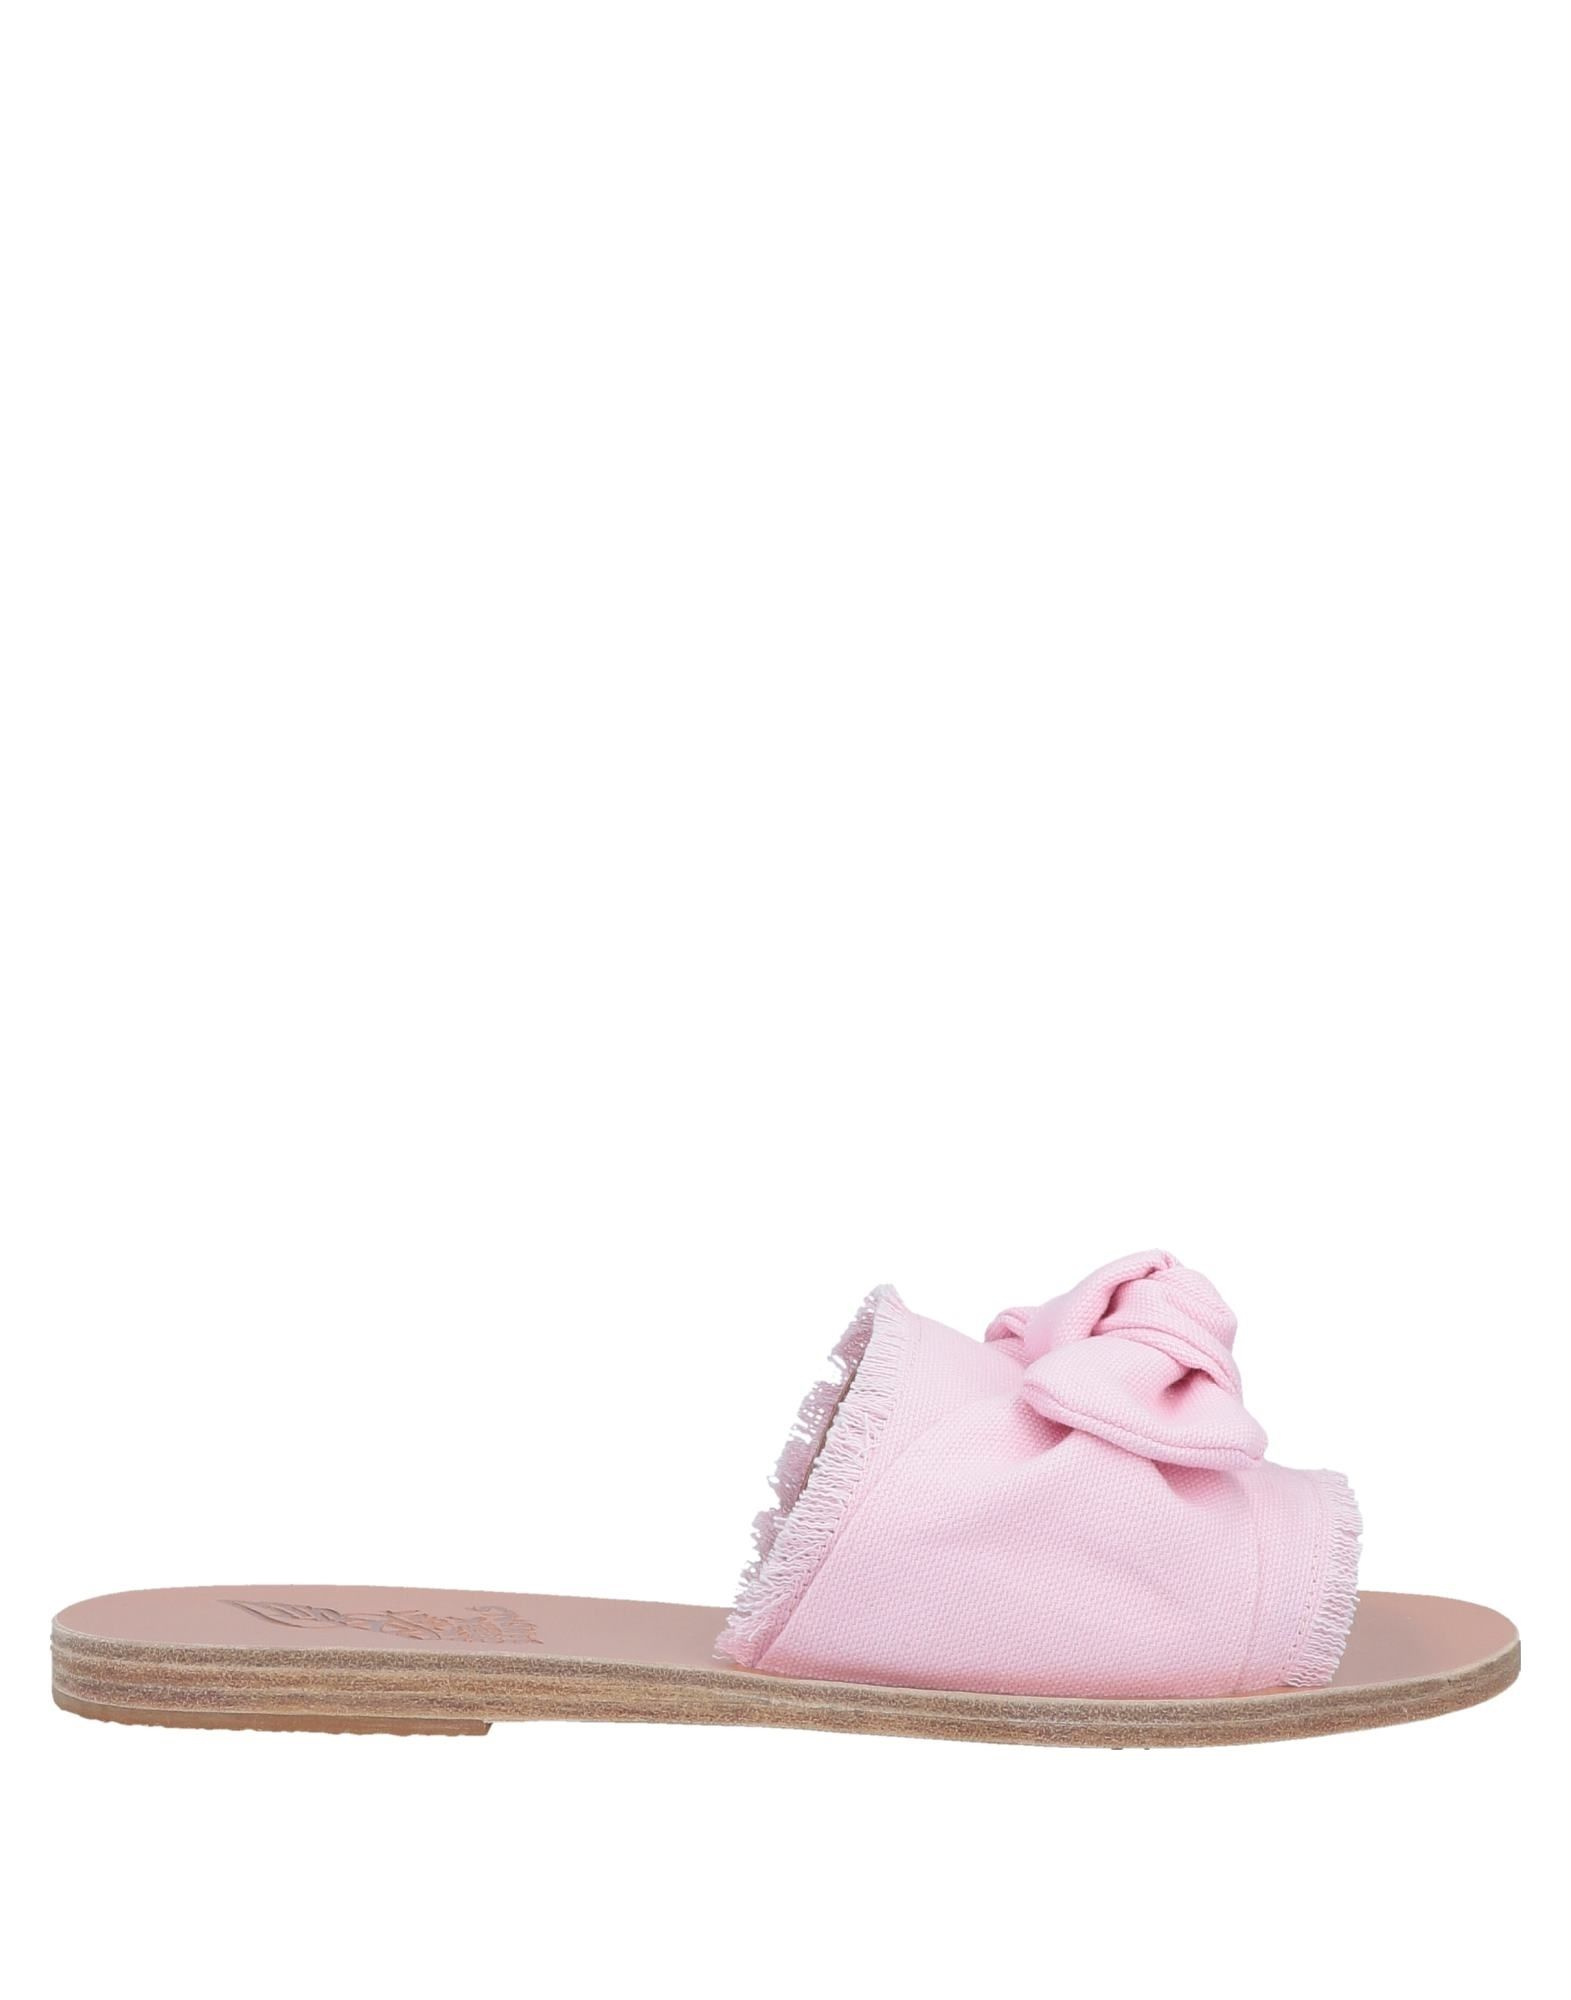 Sandales Ancient Greek Sandals Femme - Sandales Ancient Greek Sandals   - 11632999AX